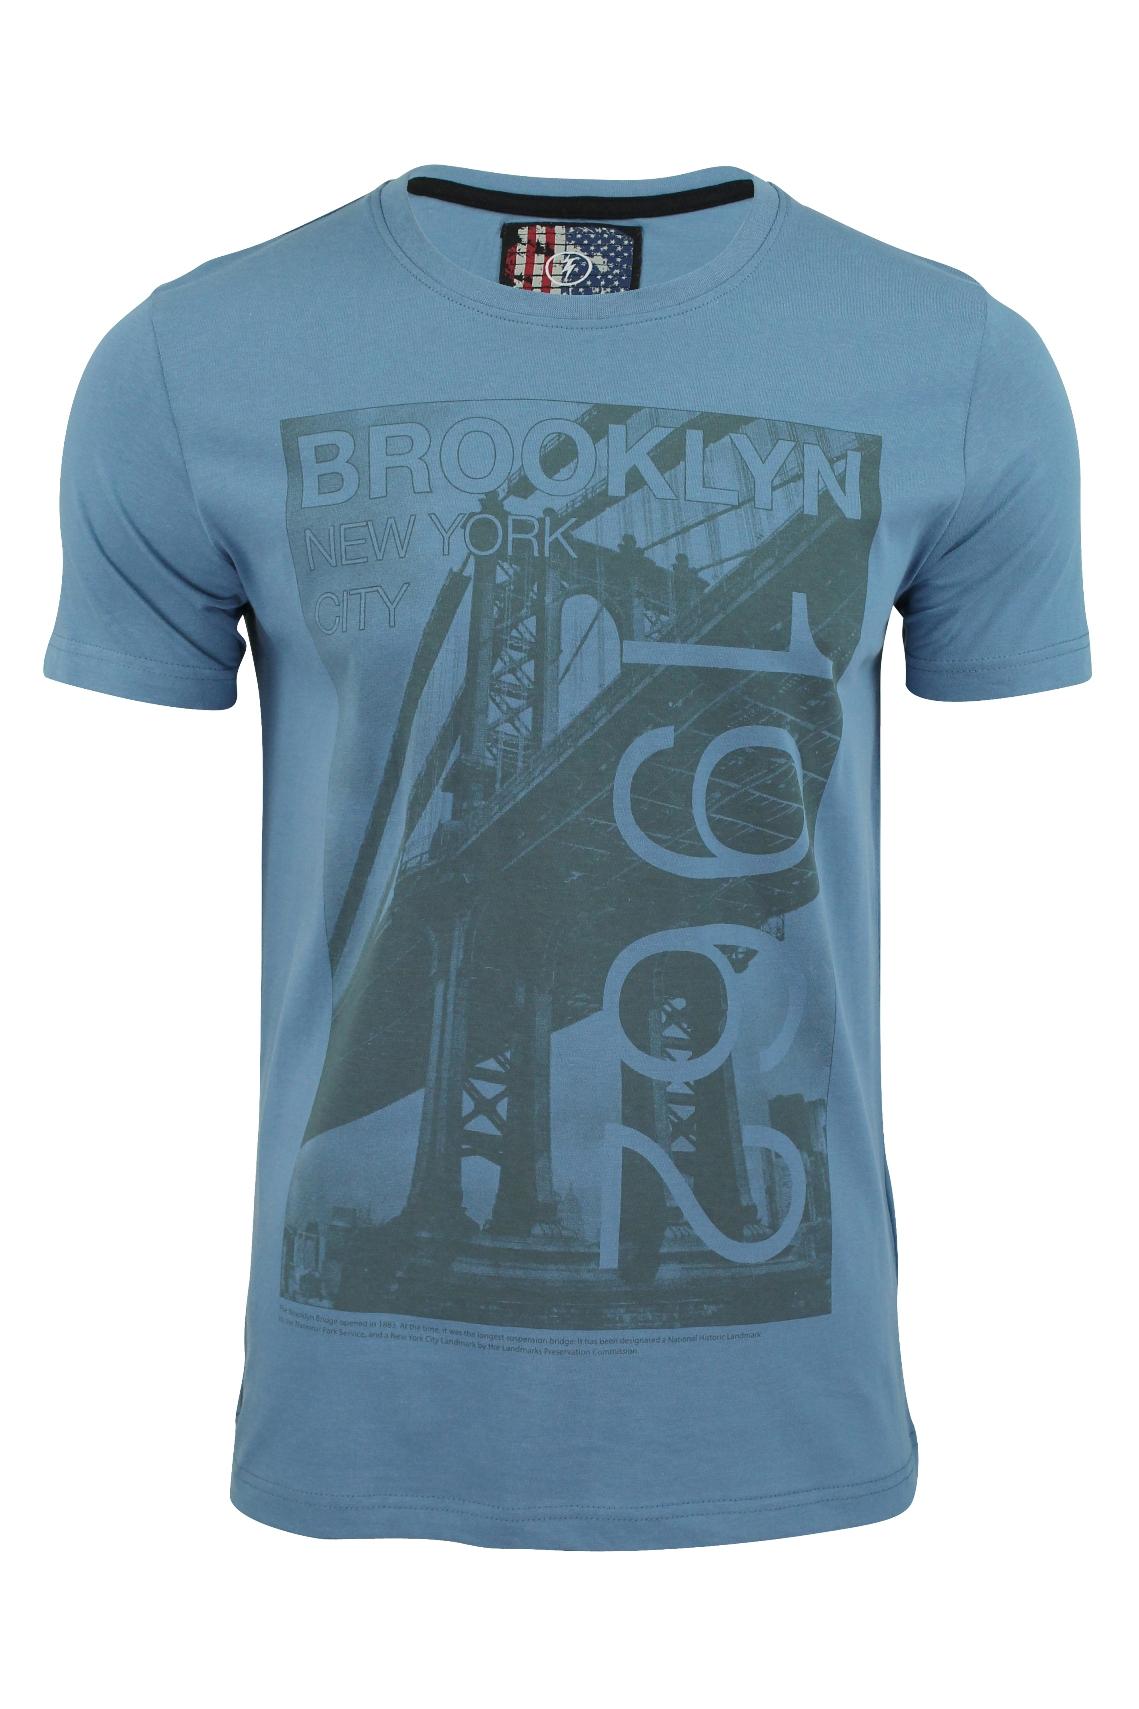 Mens t shirt by dissident 39 brooklyn 1962 39 print short for T shirt printing brooklyn